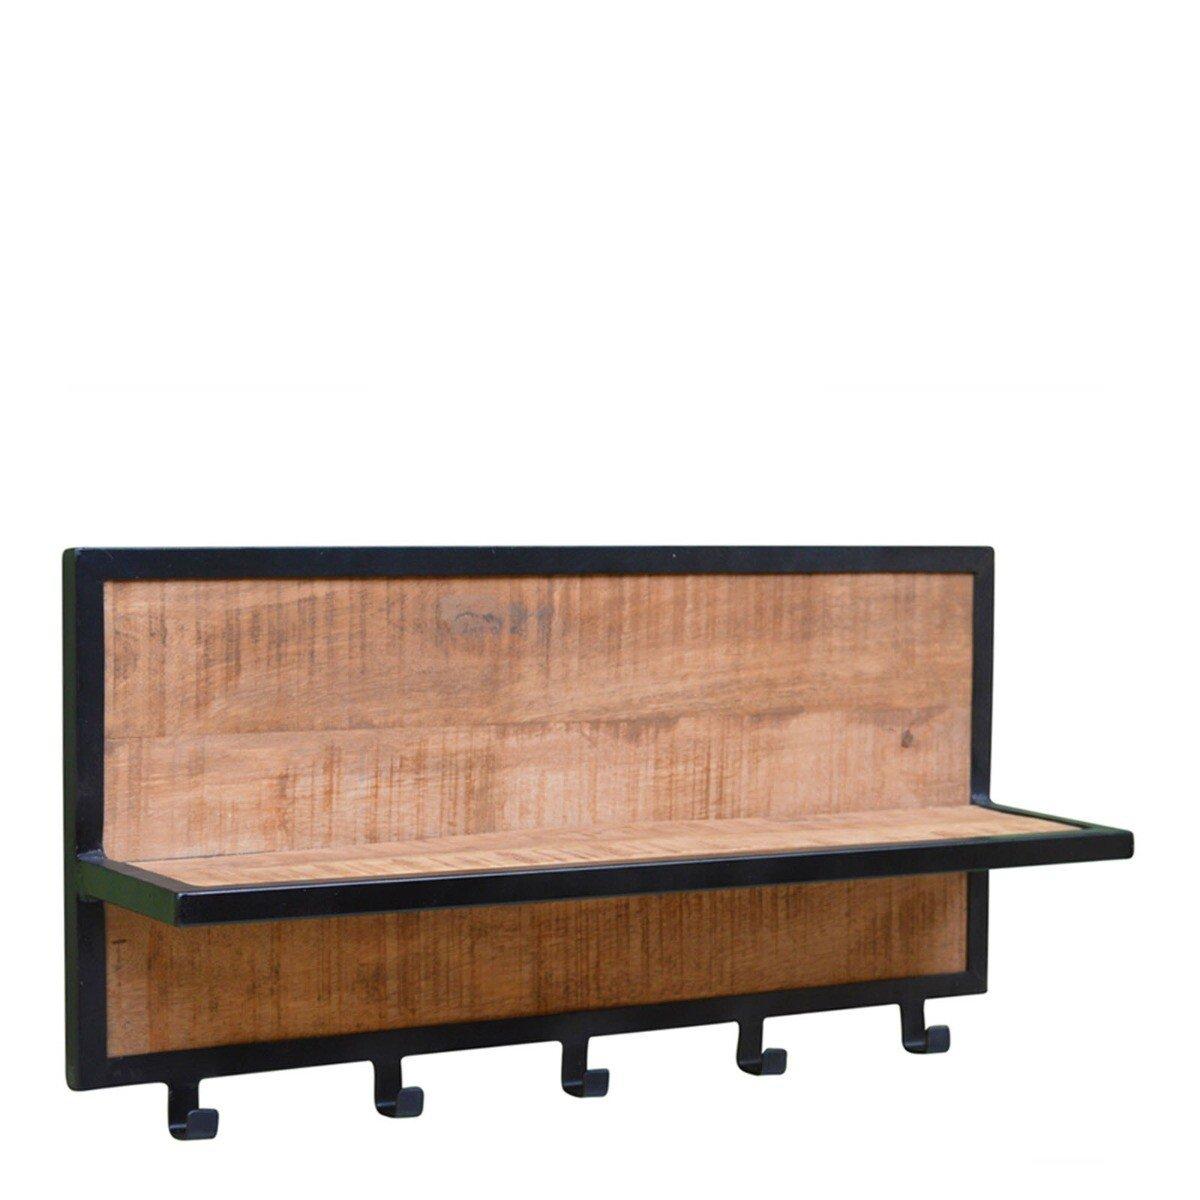 Livingfurn Kapstok Brix Caro Mango hout 30 x 70 x 15